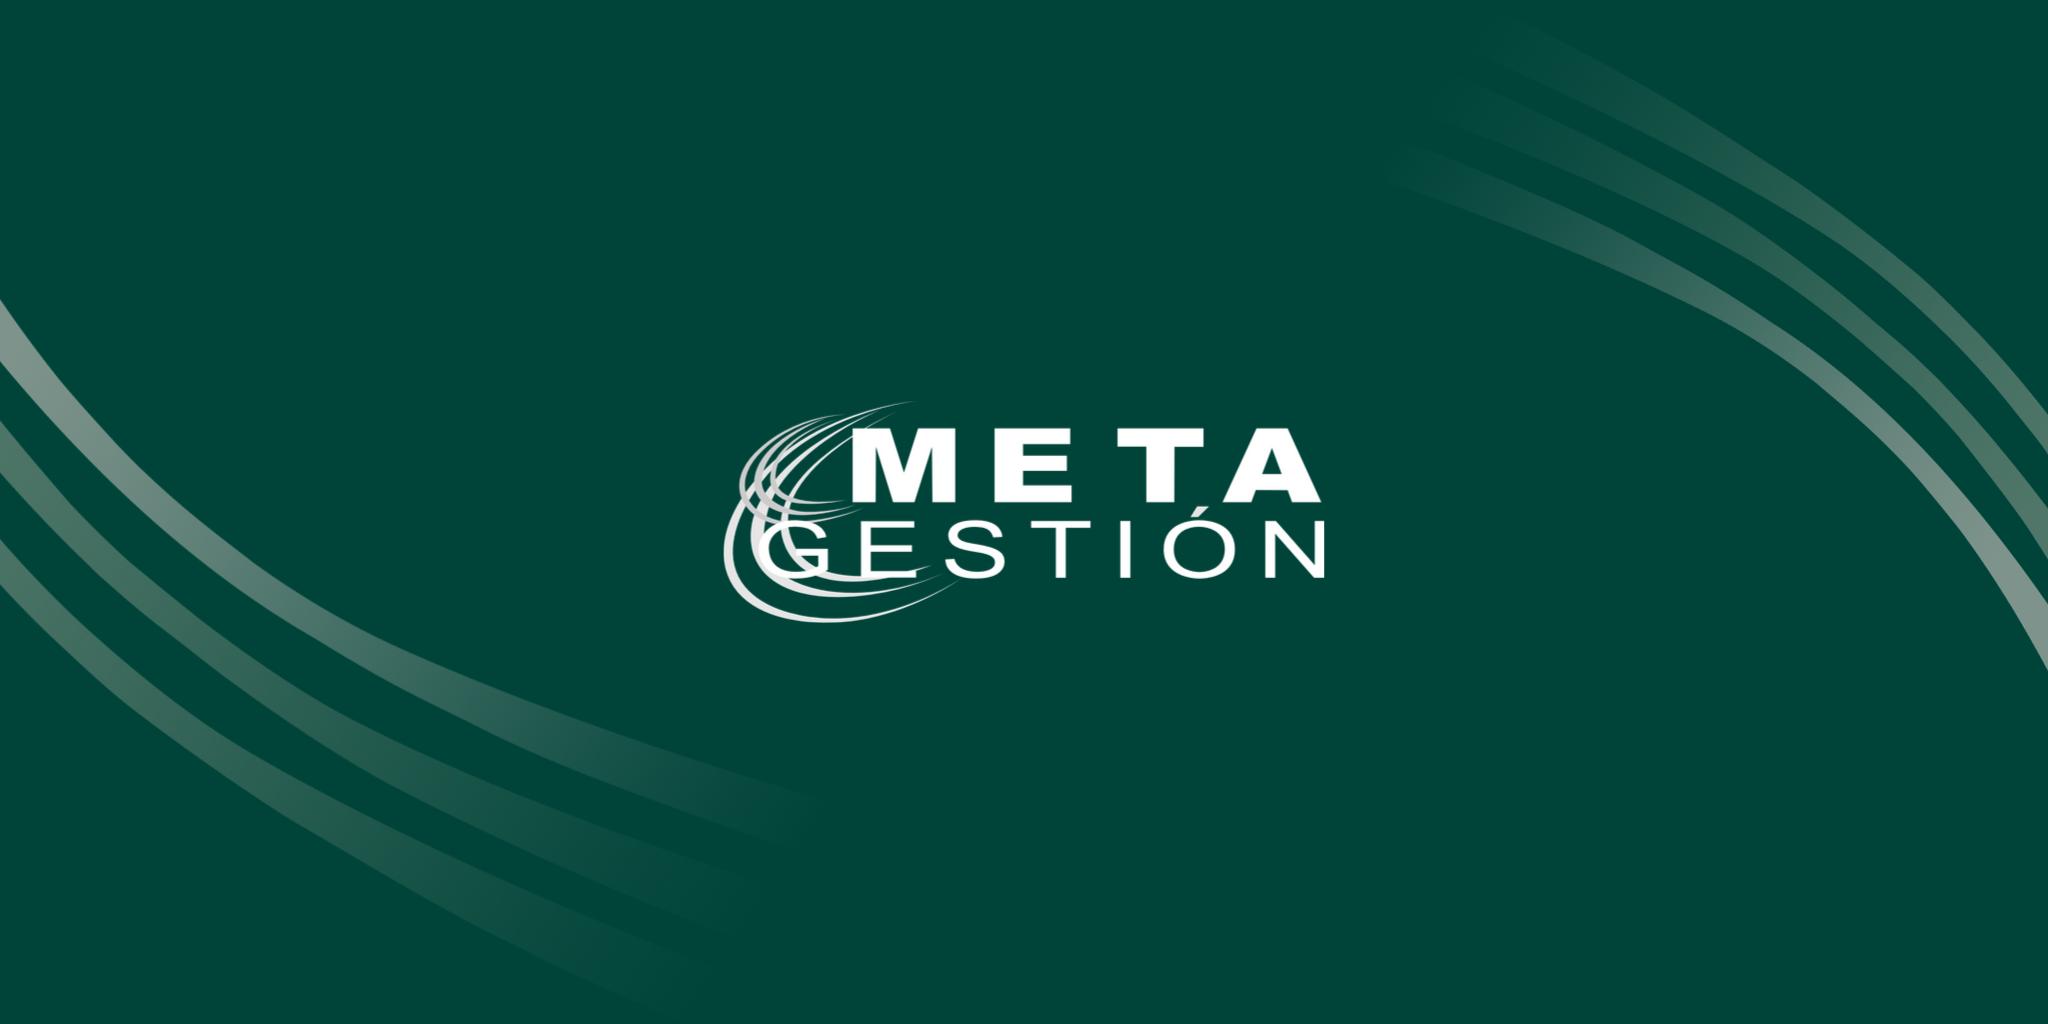 imagen destacada Metavalor FI líder de 2020 en Expansion